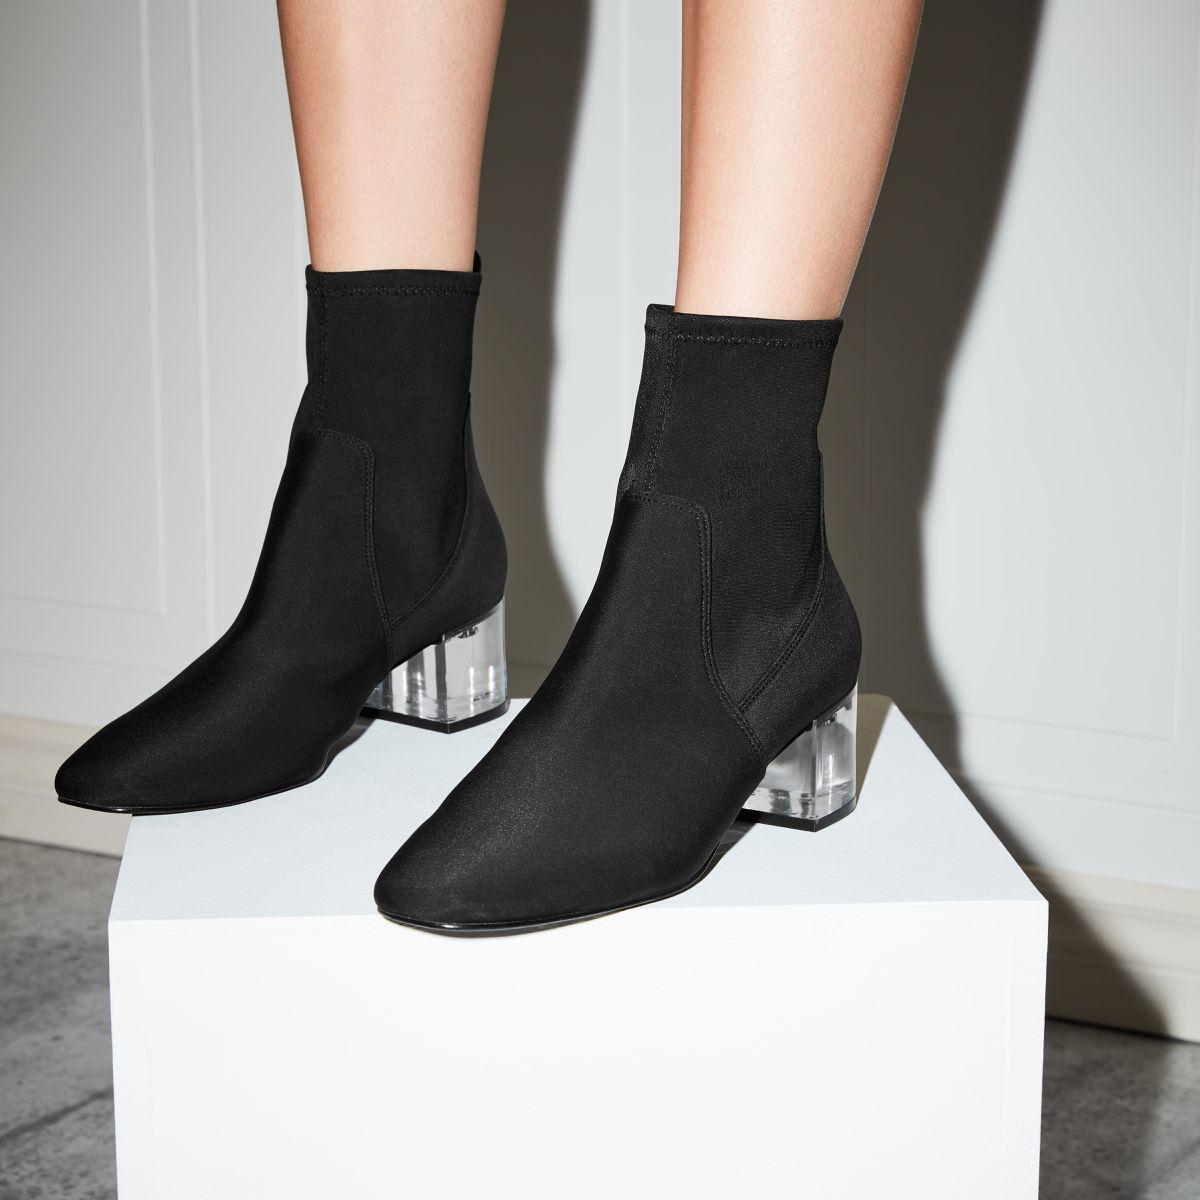 aldo shoes tessy bordeaux miscellaneous things (4